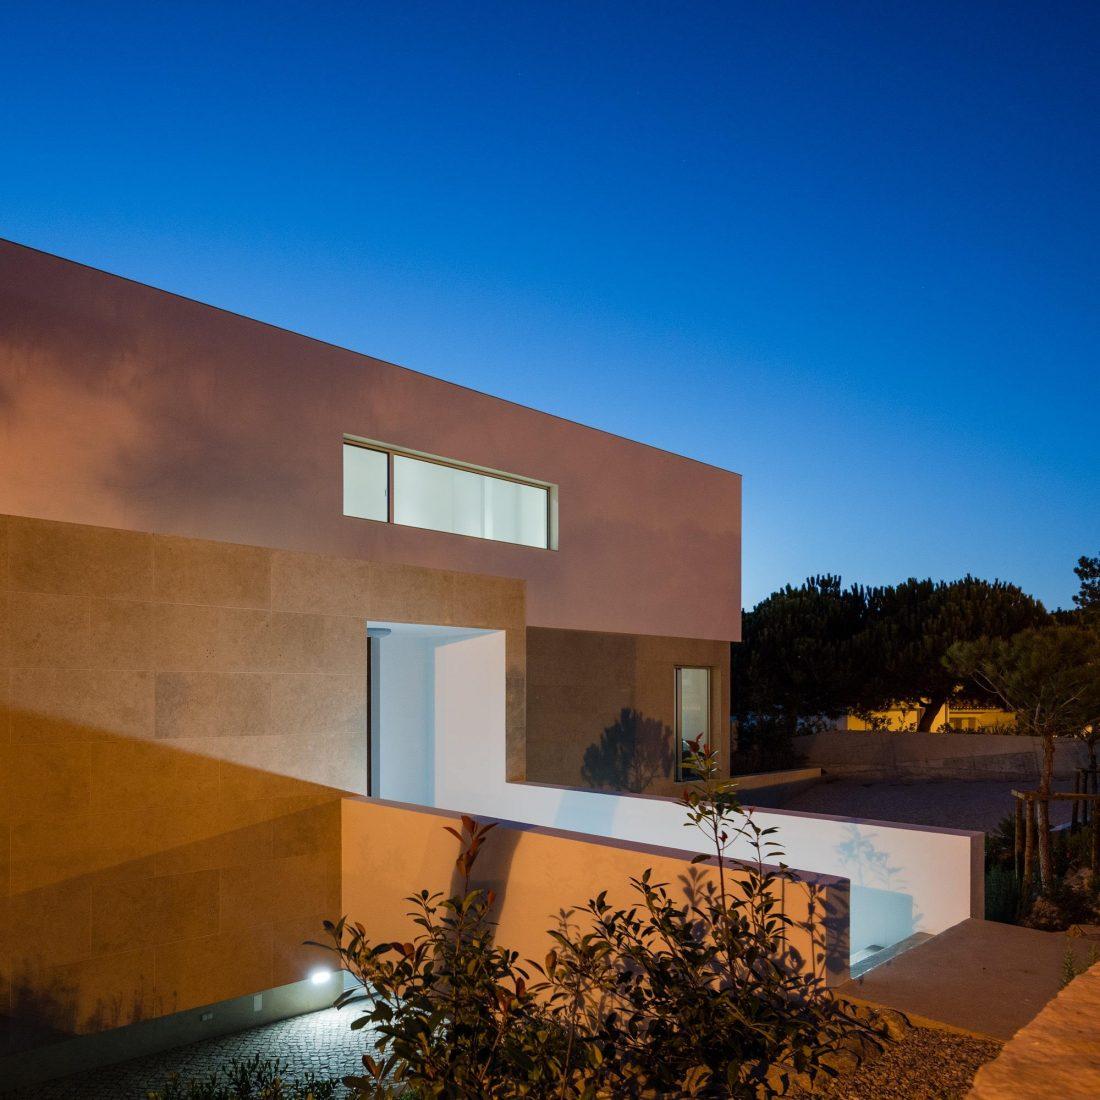 Дом в Обидуше, Португалия, от студии RSM arquitecto и Russell Jones Architects 23